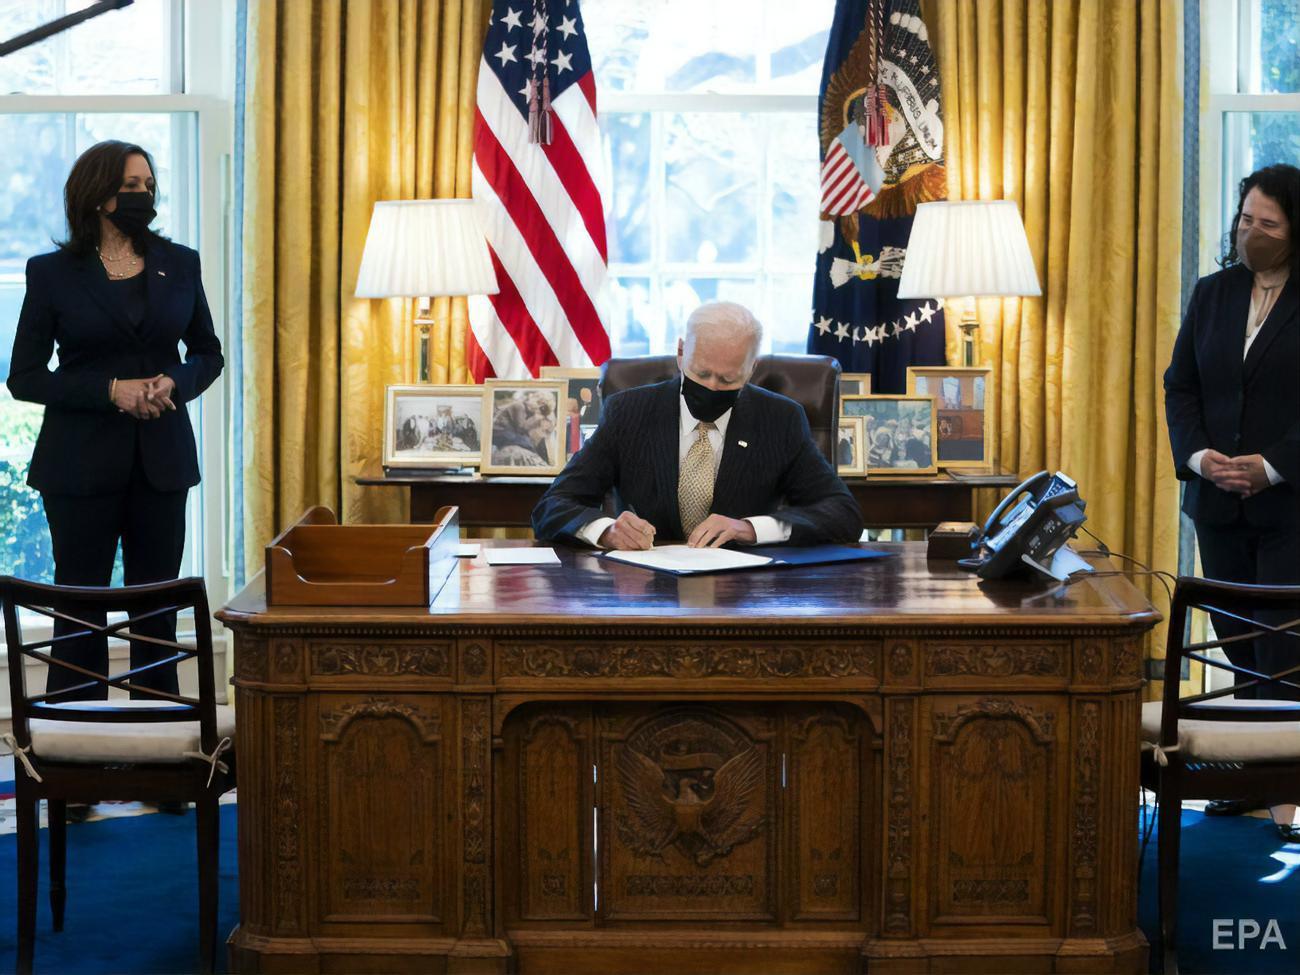 Biden signs decree imposing sanctions on Russia: US expels ten Russian diplomats